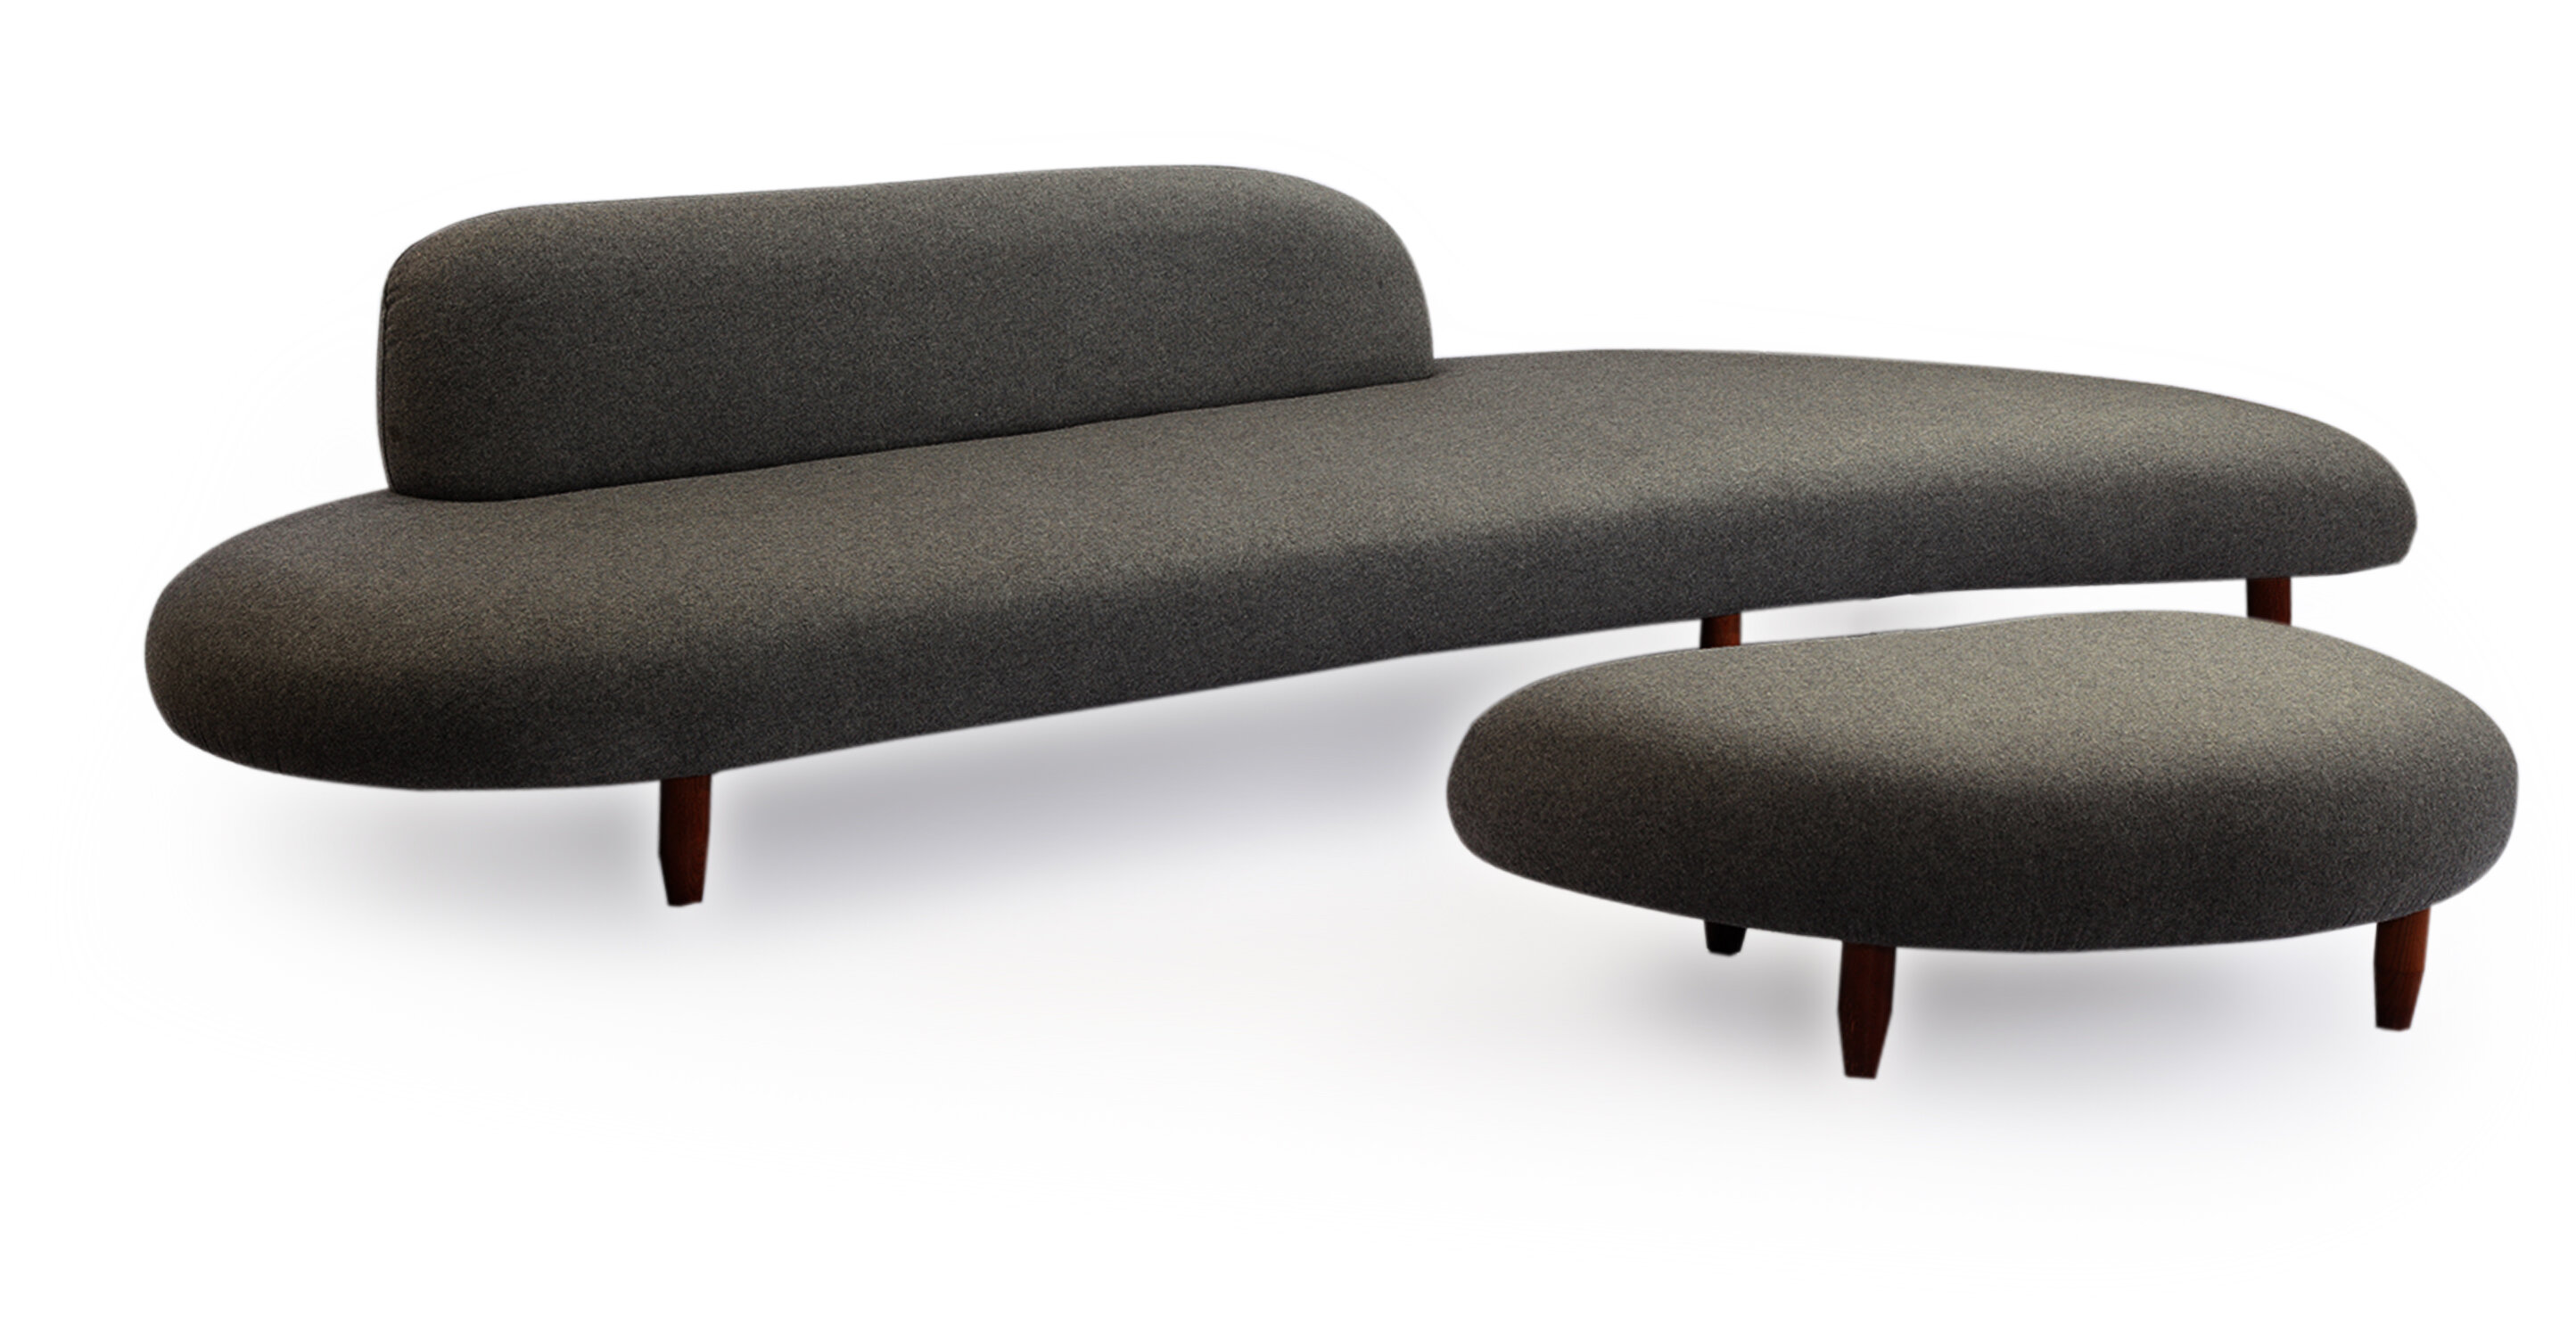 Brayden Studio Potvin Mid Century Modern Sofa And Ottoman Set Reviews Wayfair